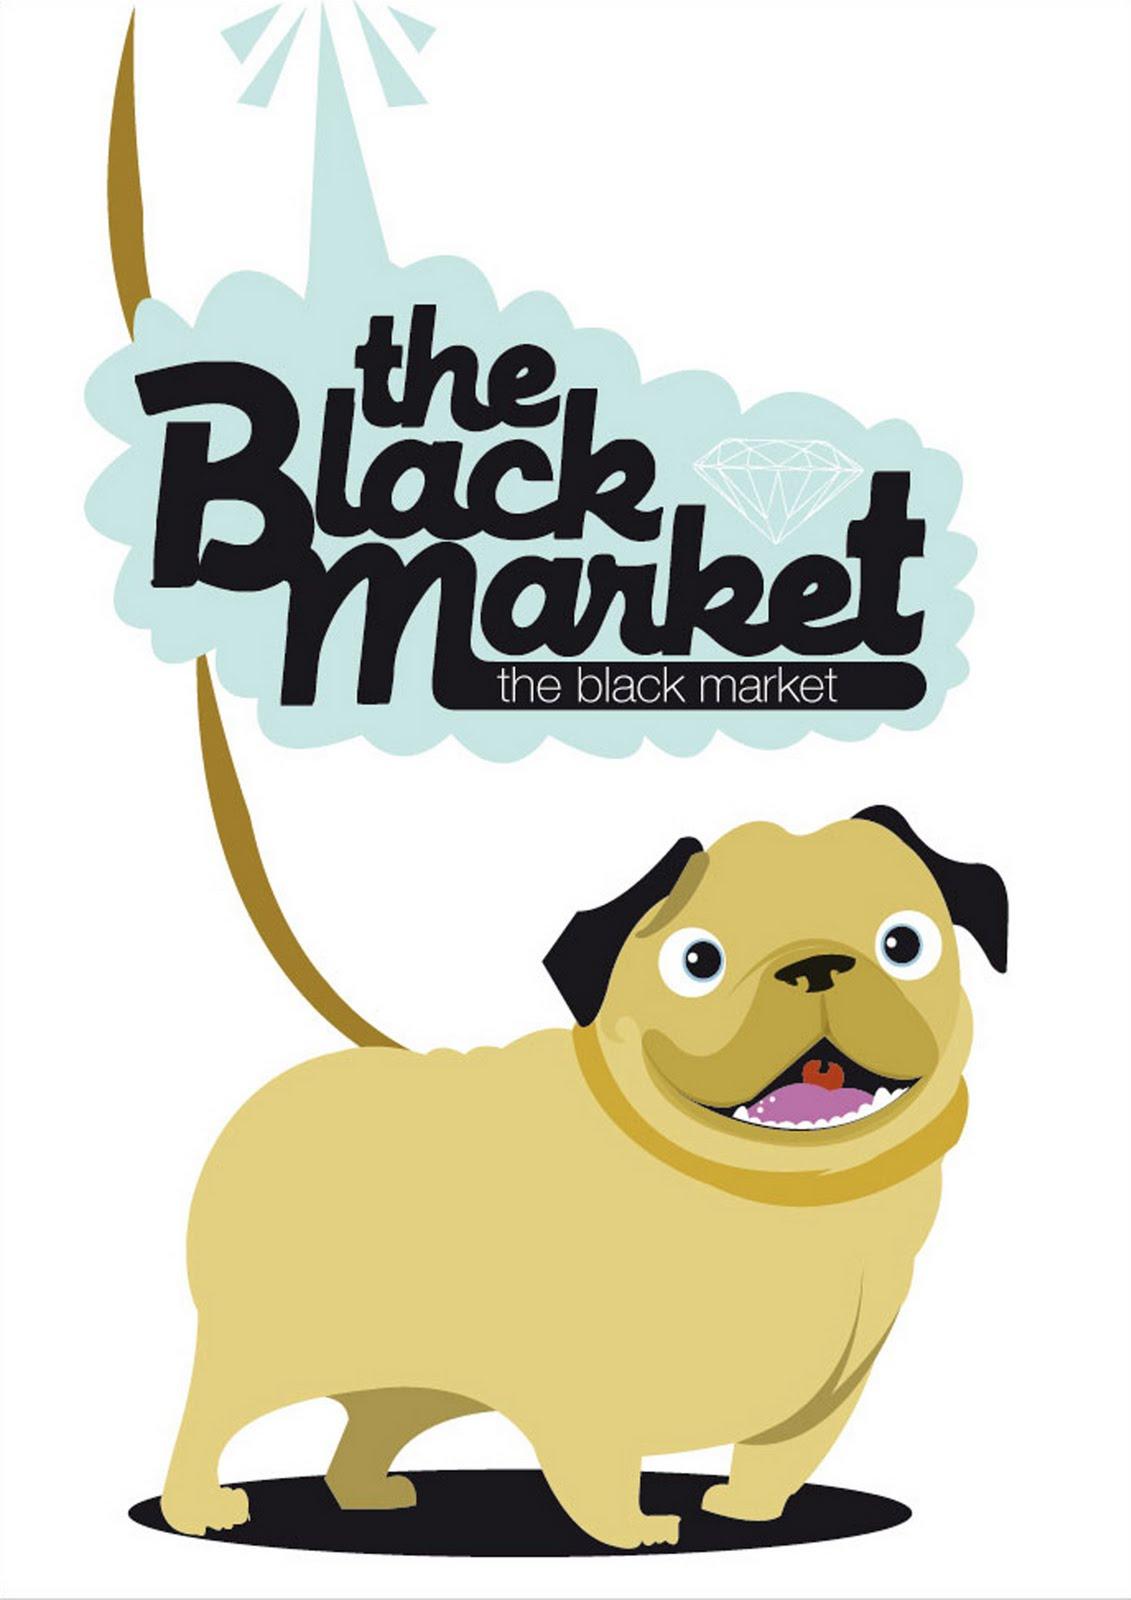 The BlackMarket VLC